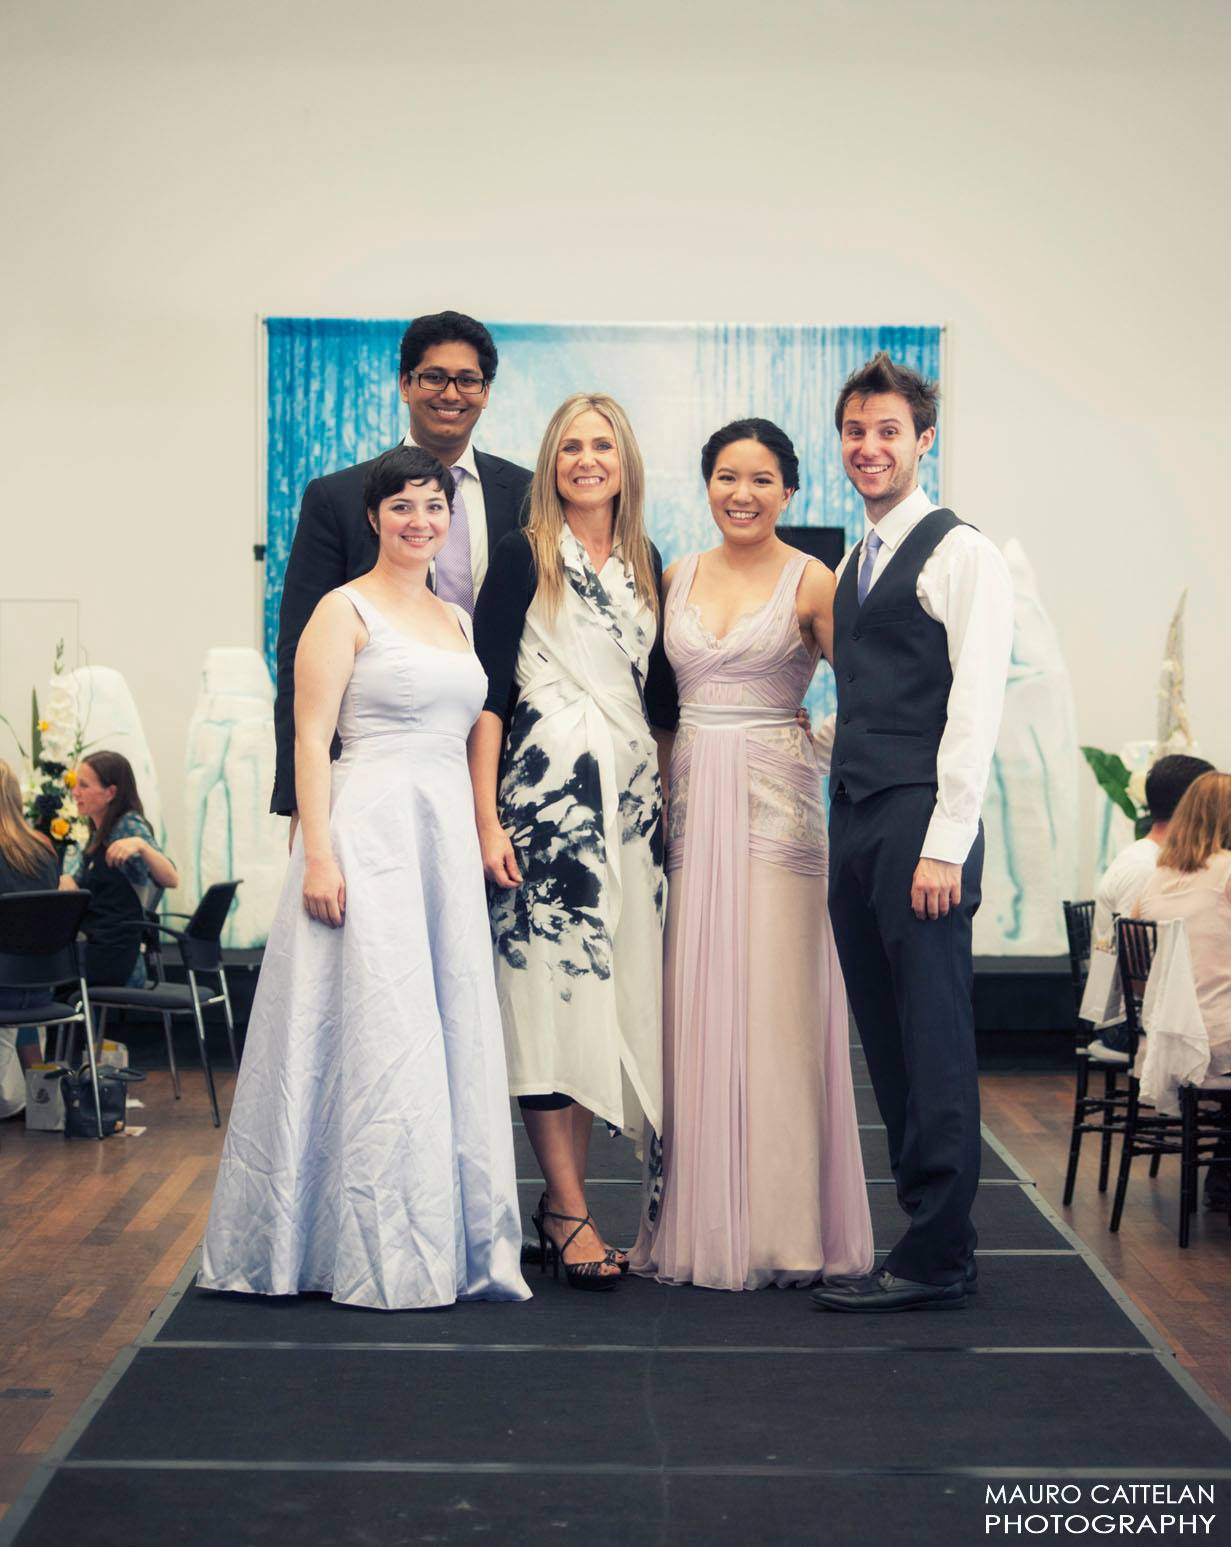 perth-function-string-music-hire-wedding-riverside-musiciansperth-function-string-music-hire-wedding-riverside-musicians-classical-contemporary-bride-groom-quartet-violinist-viola-cello